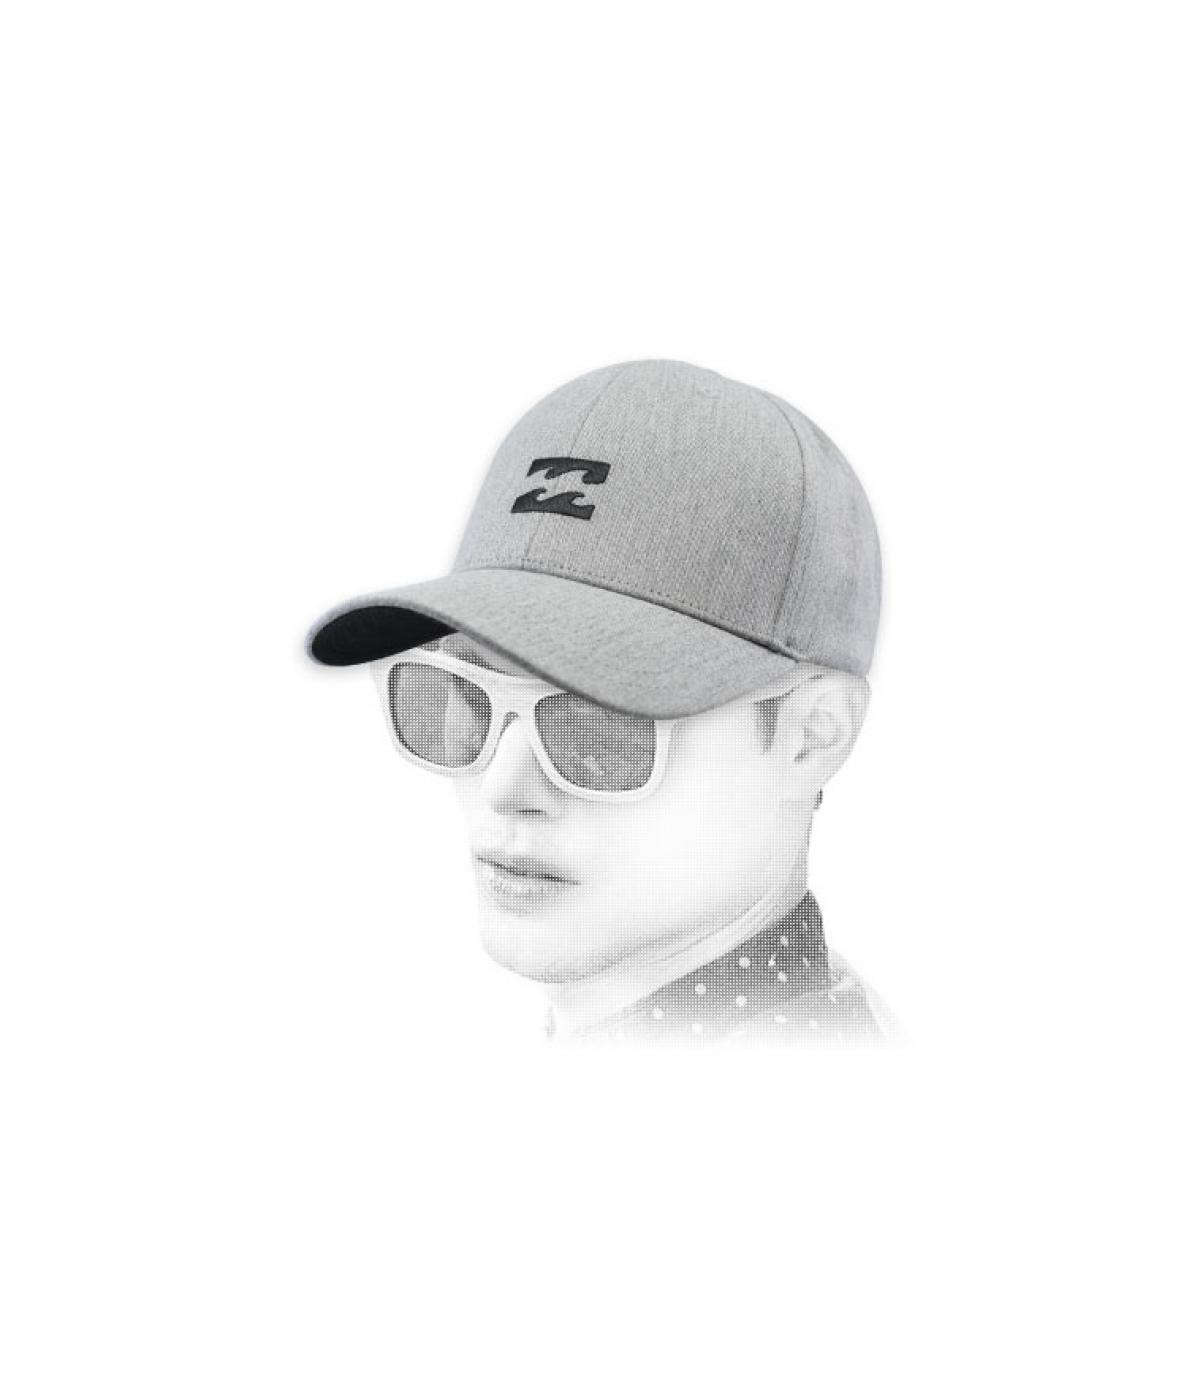 Billabong grijs heather cap